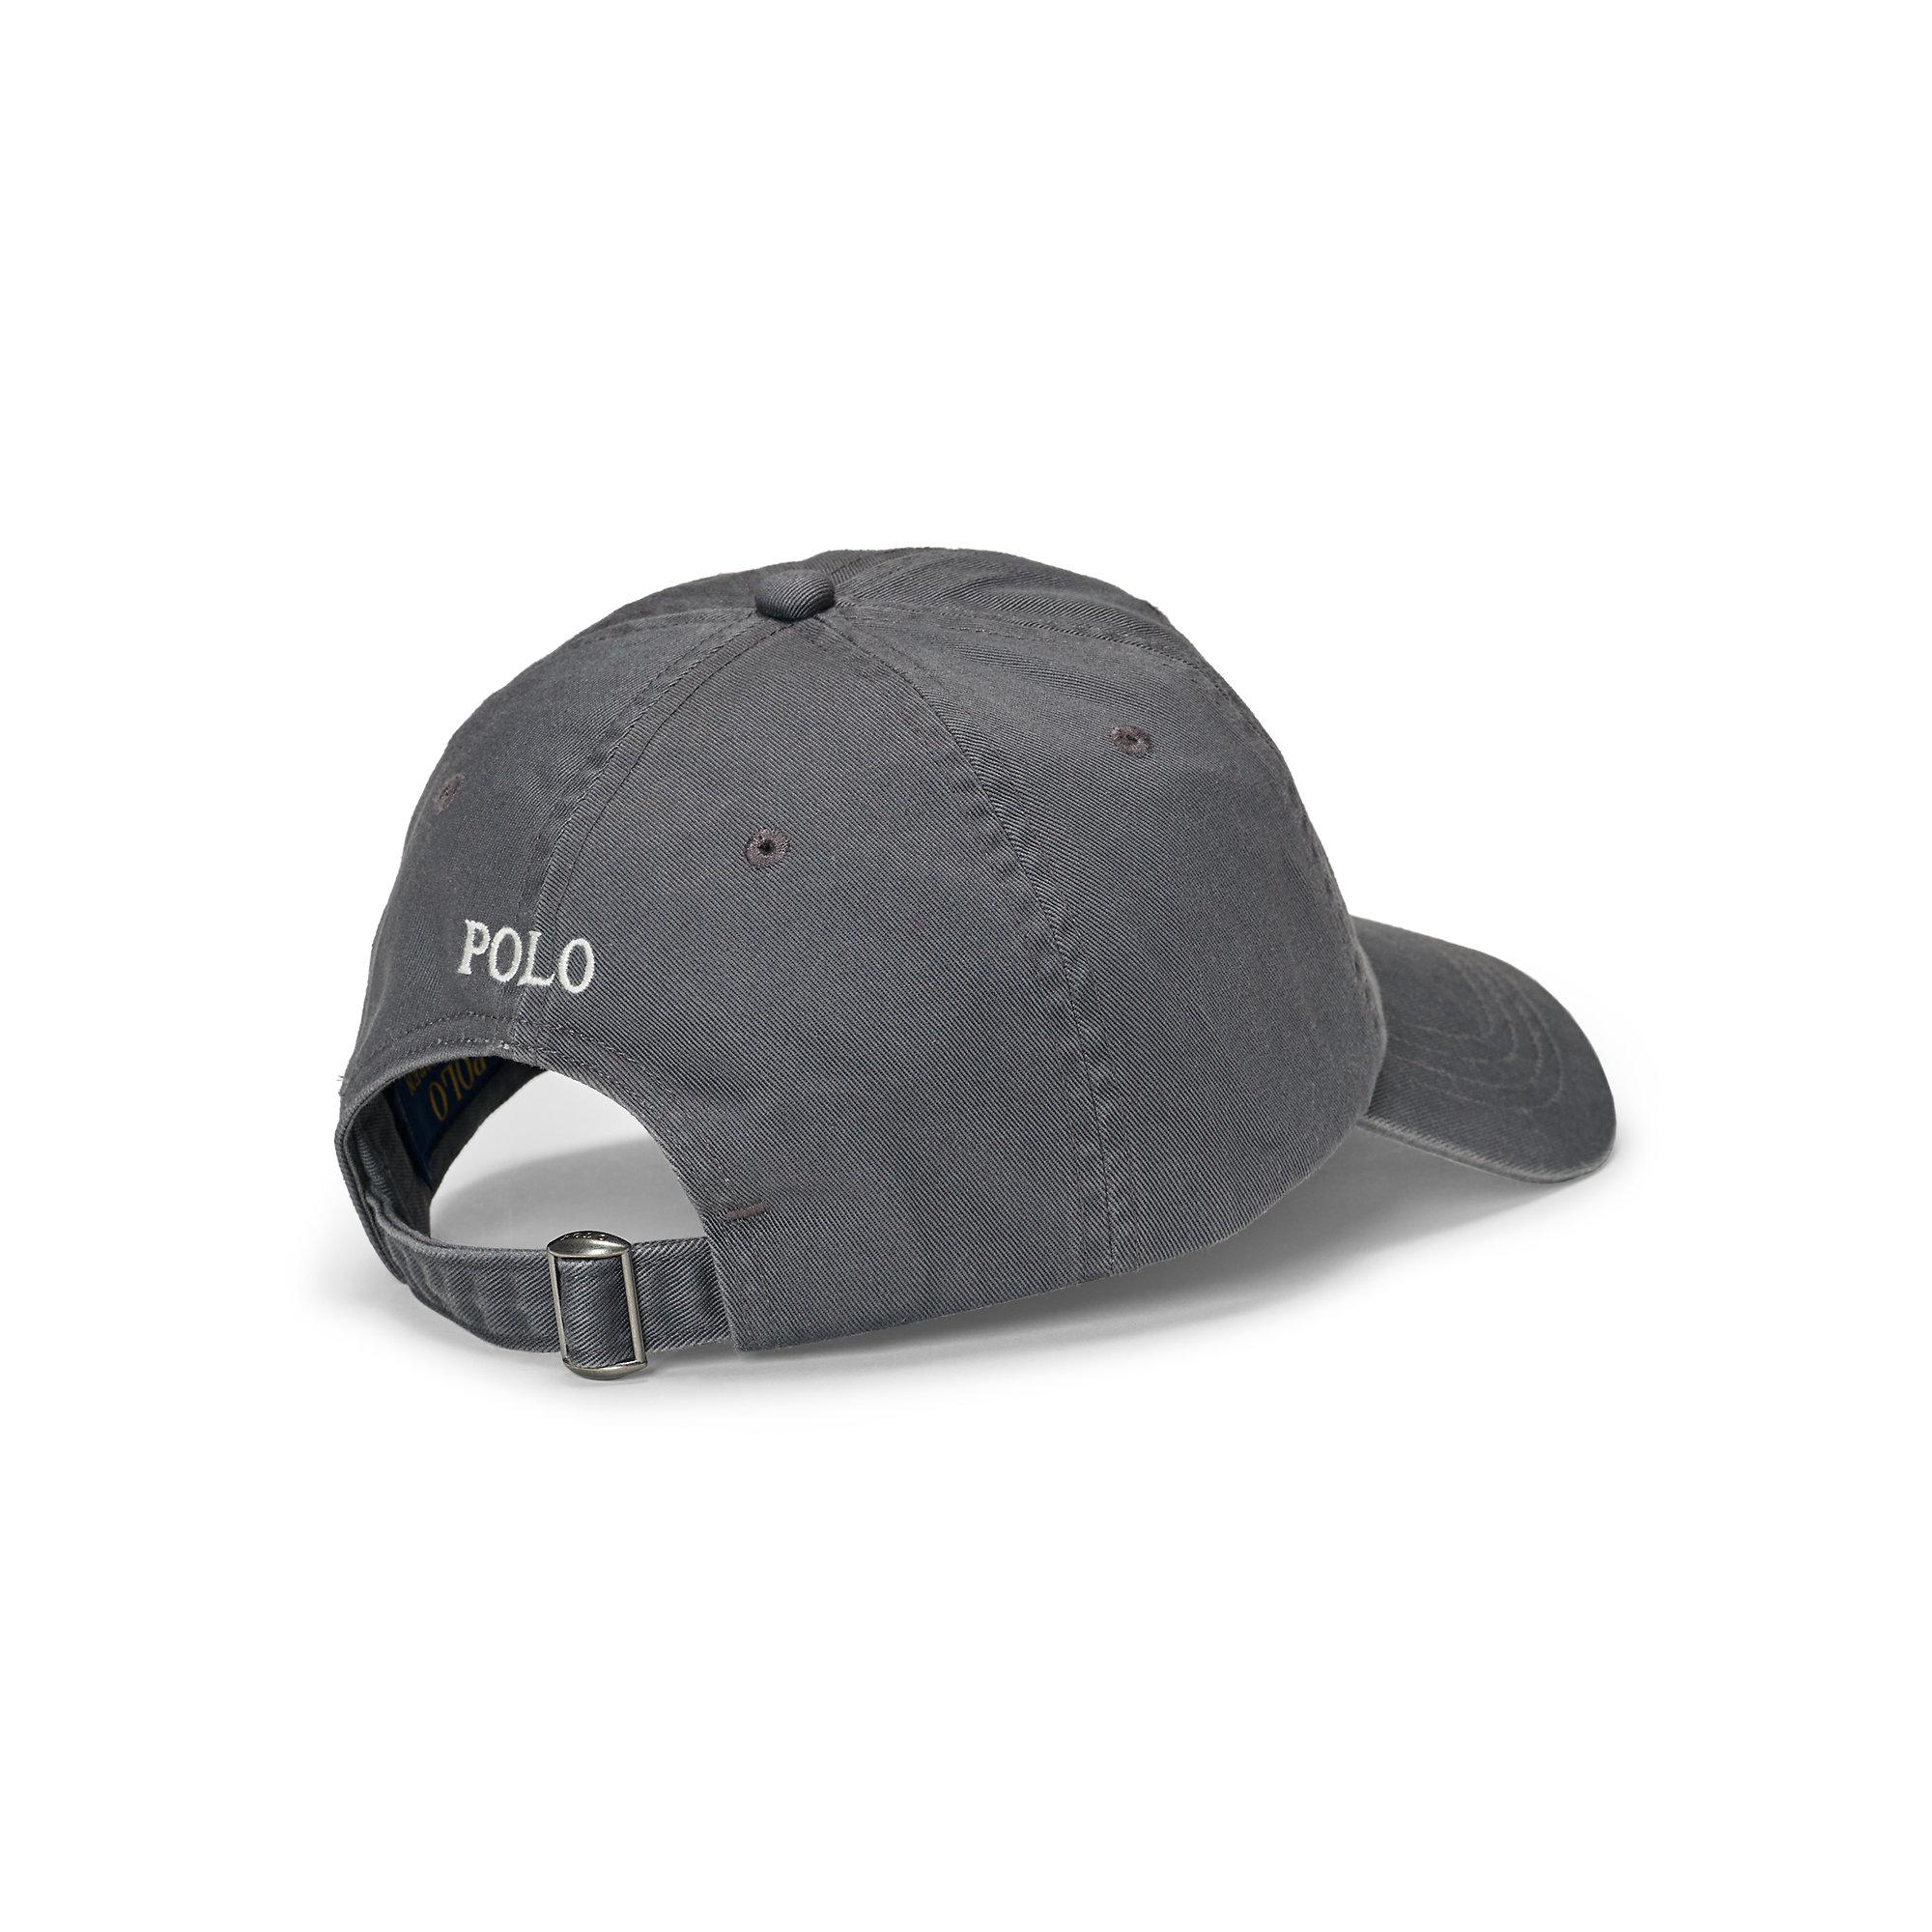 Lyst - Polo Ralph Lauren Cotton Chino Baseball Cap in Gray for Men 24dd6e1f666